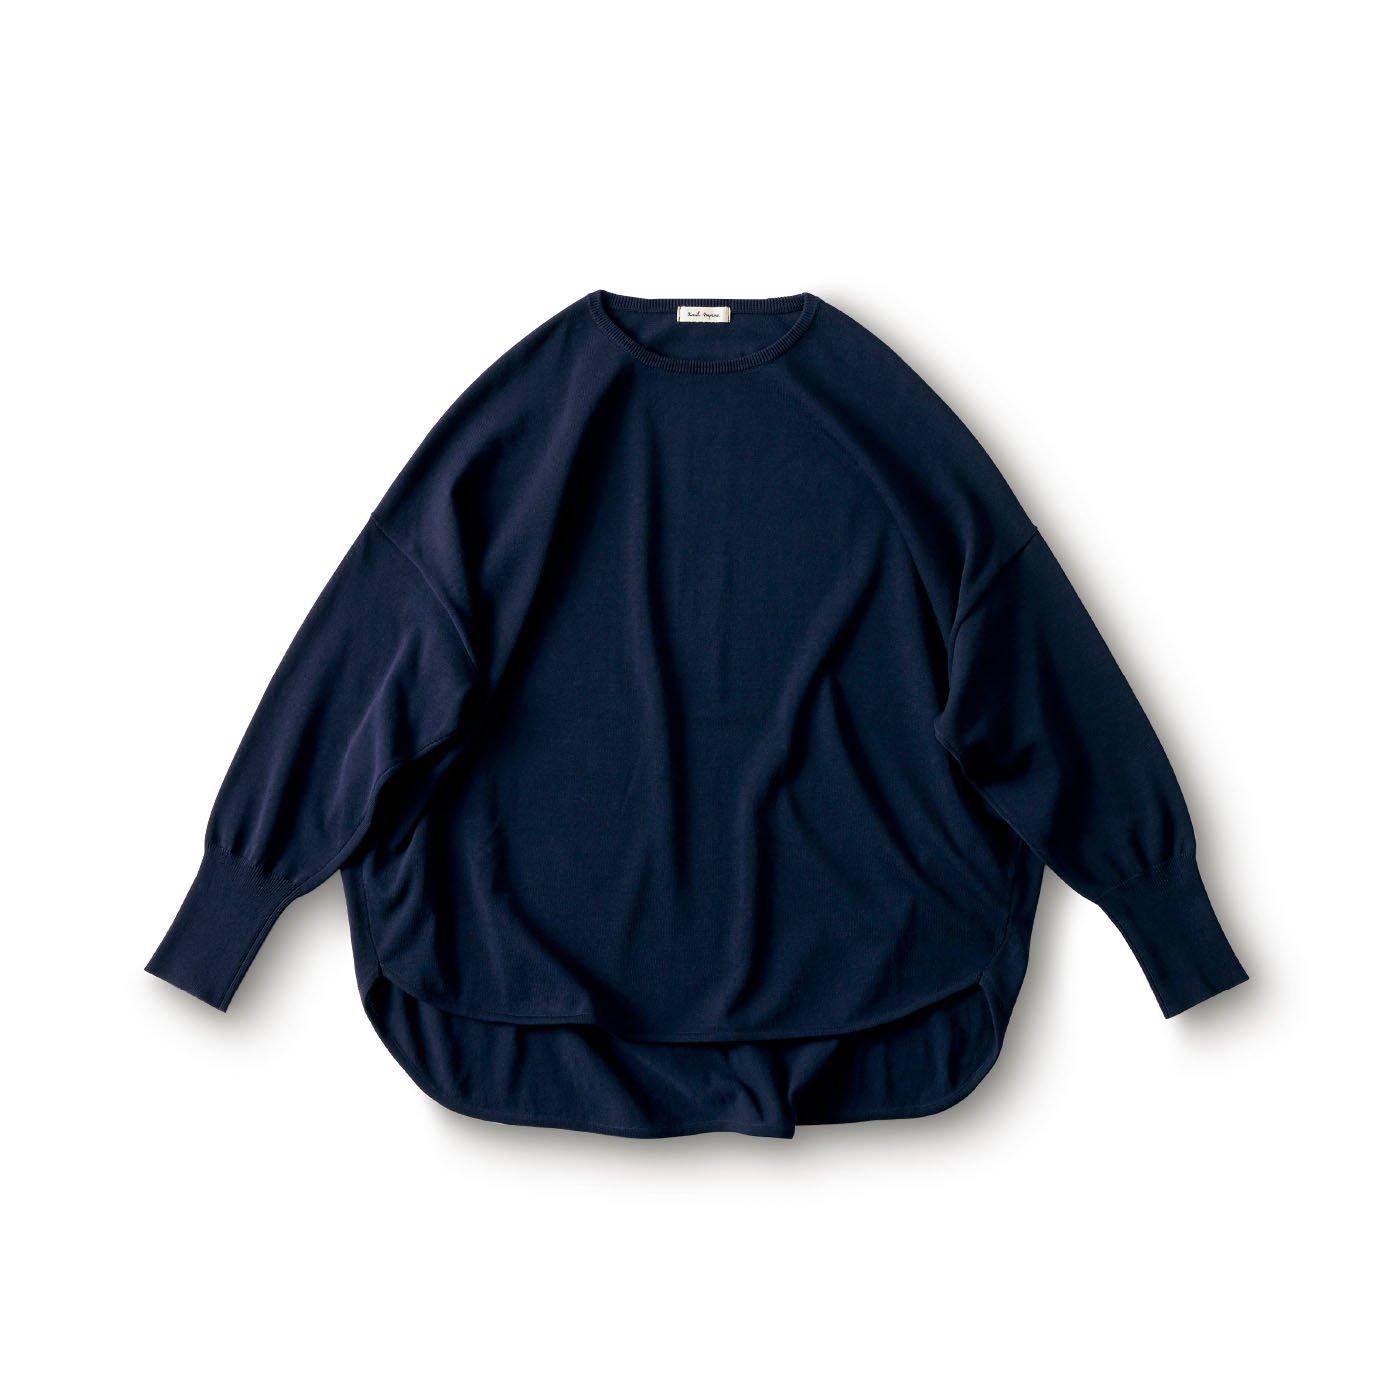 and myera 丸みのあるセーター〈ネイビー〉